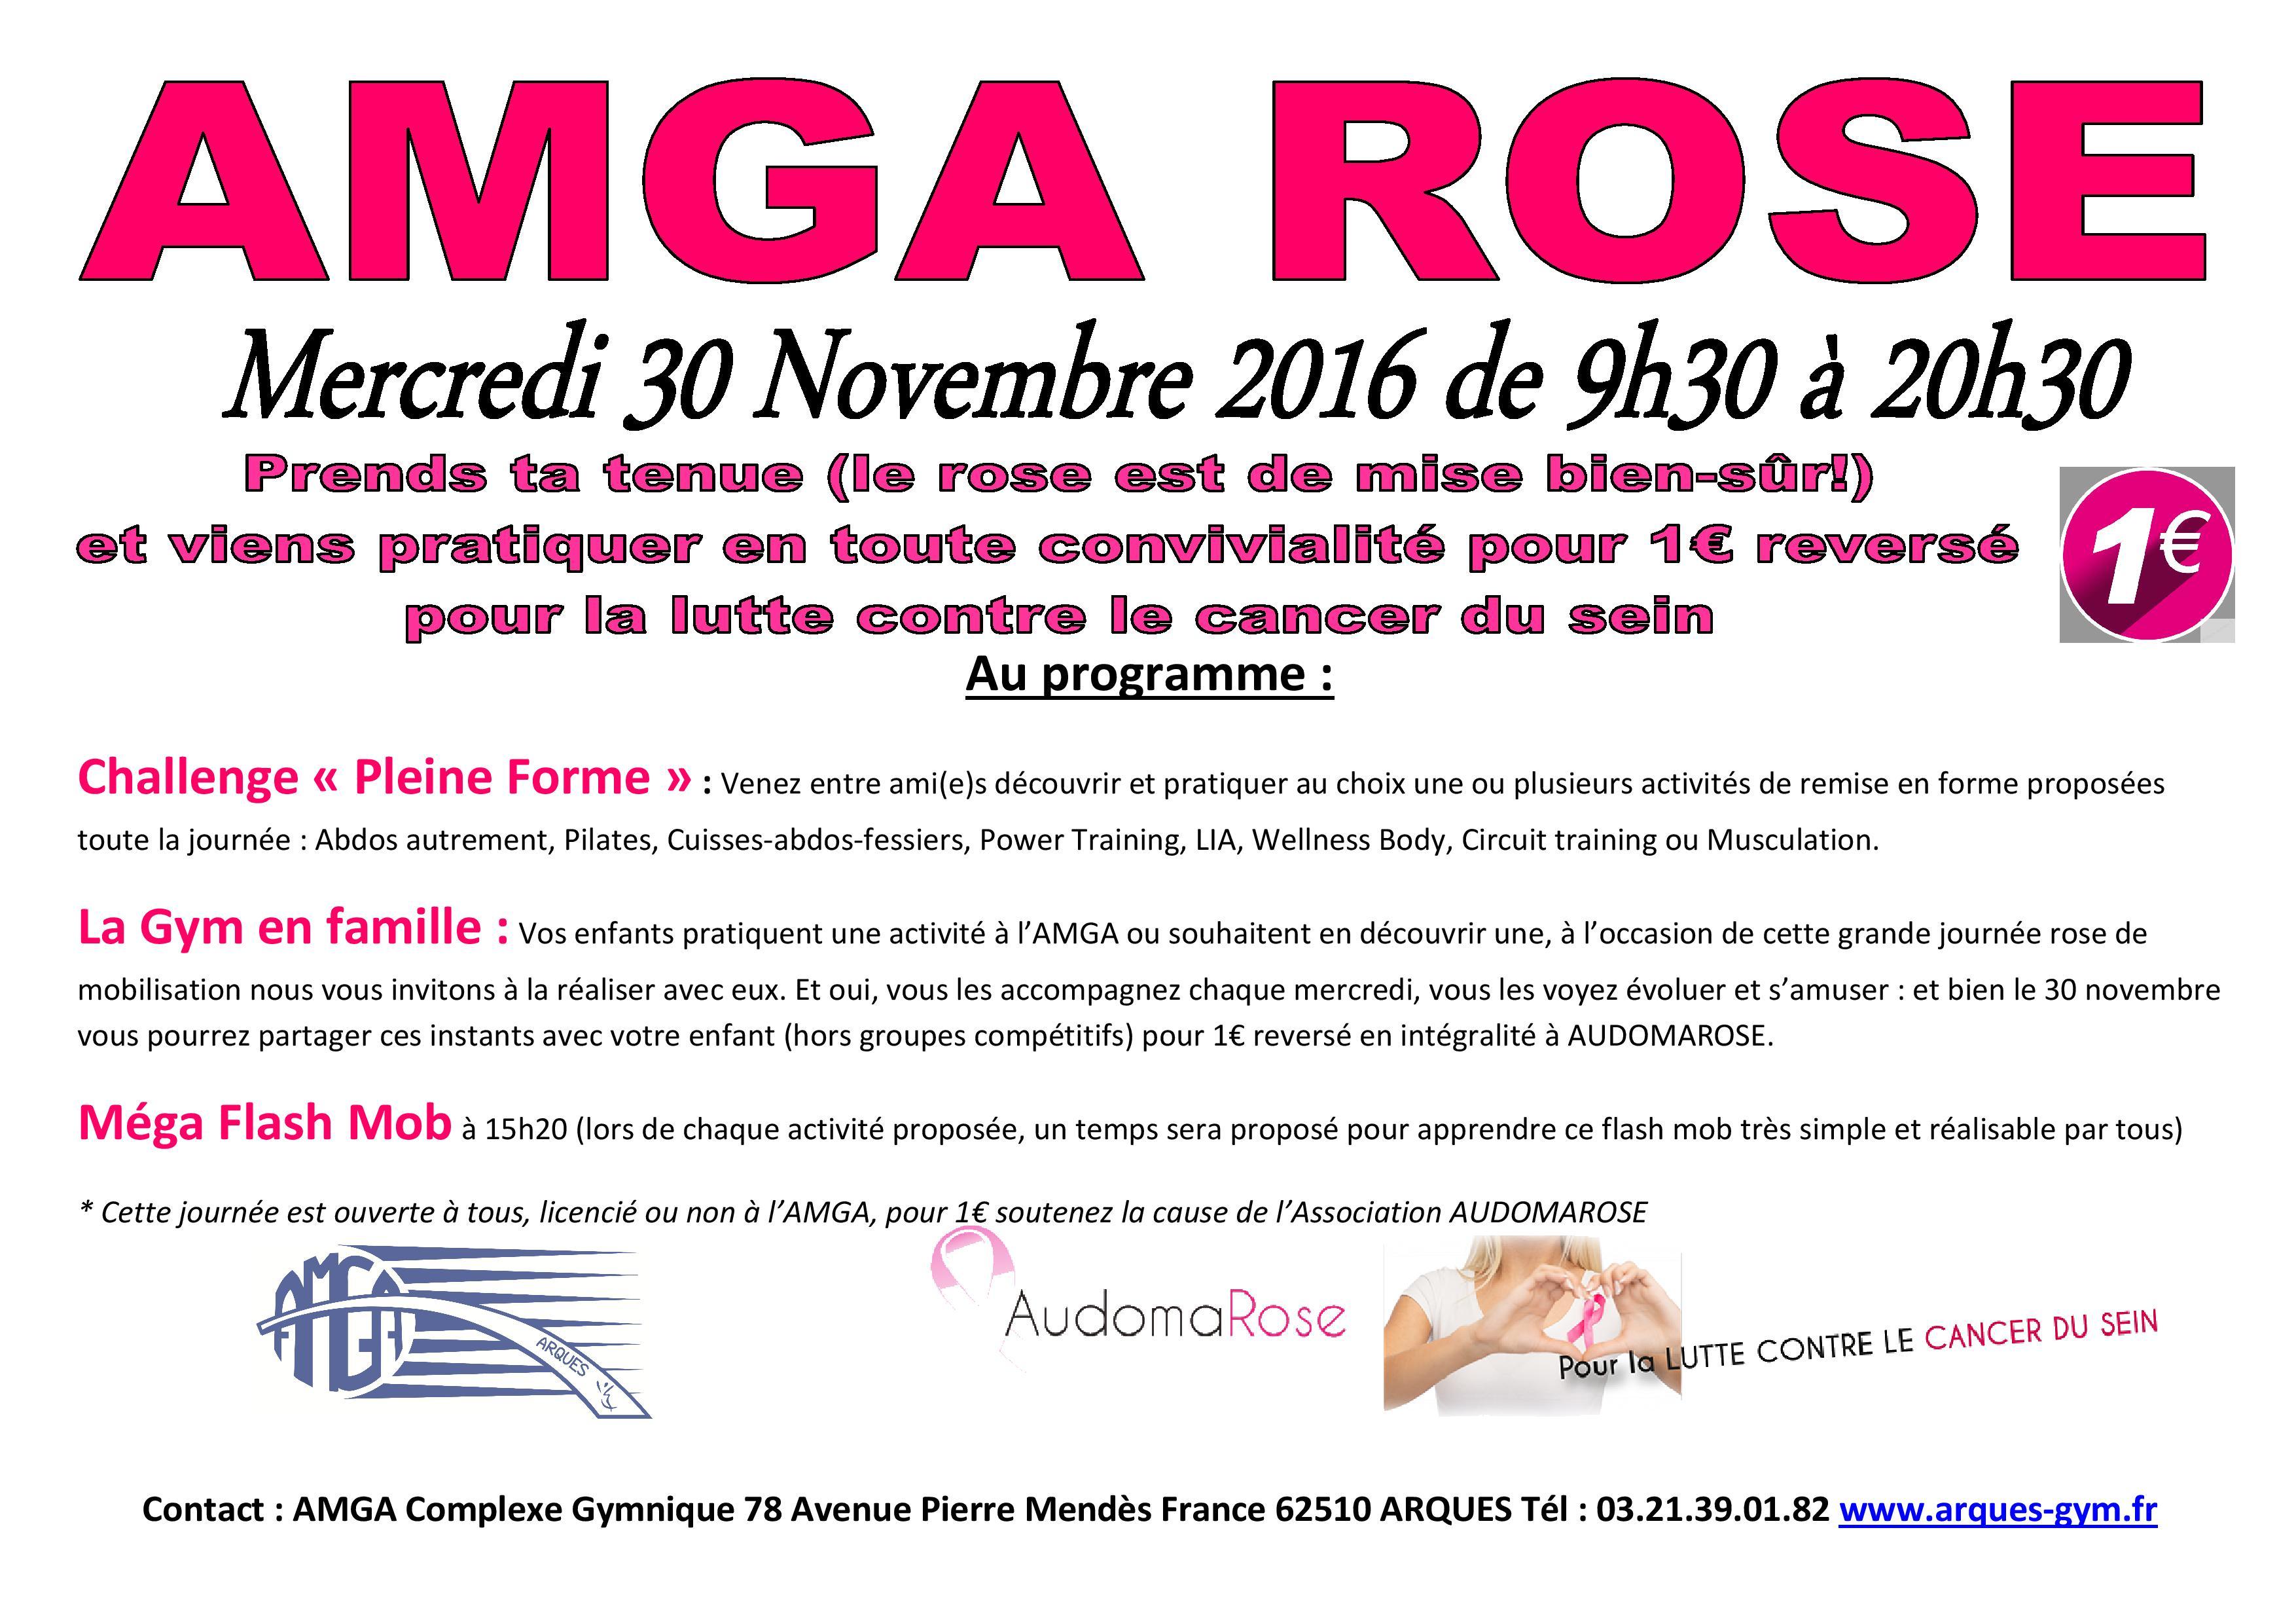 Flash-Mob pour l'AMGA Rose du Mercredi 30 Novembre 2016